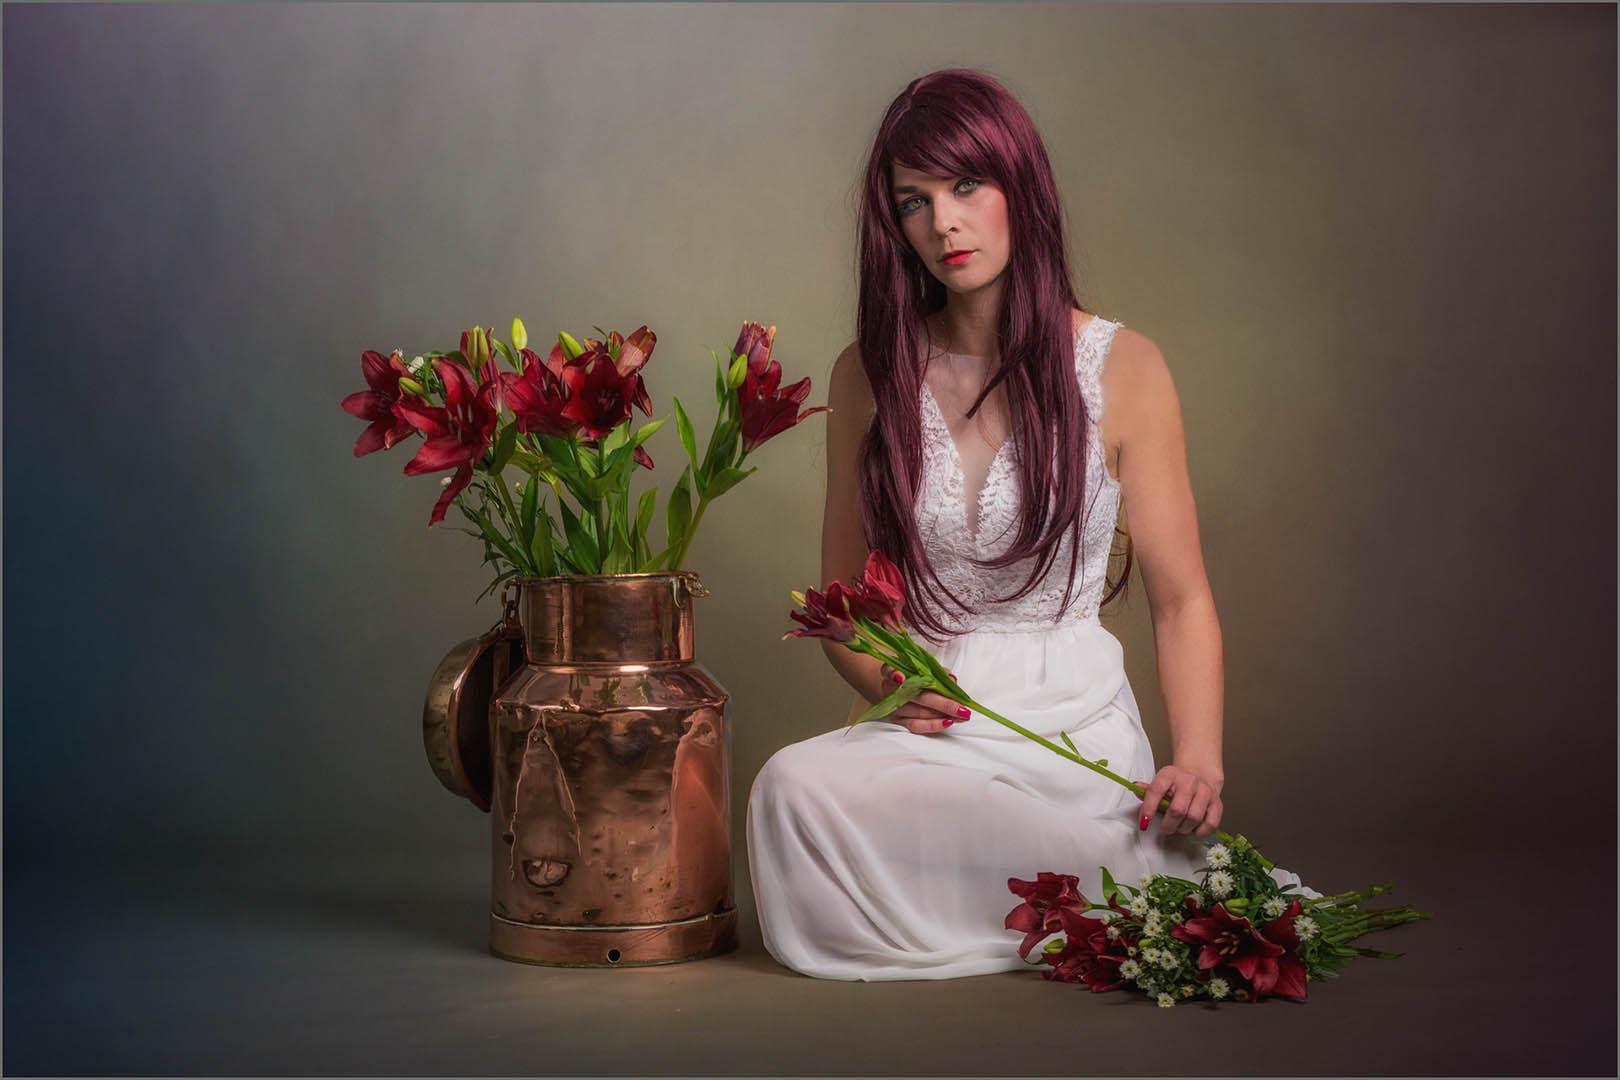 4_PI_Flowers in the Milk Can _Stephen Kangisser